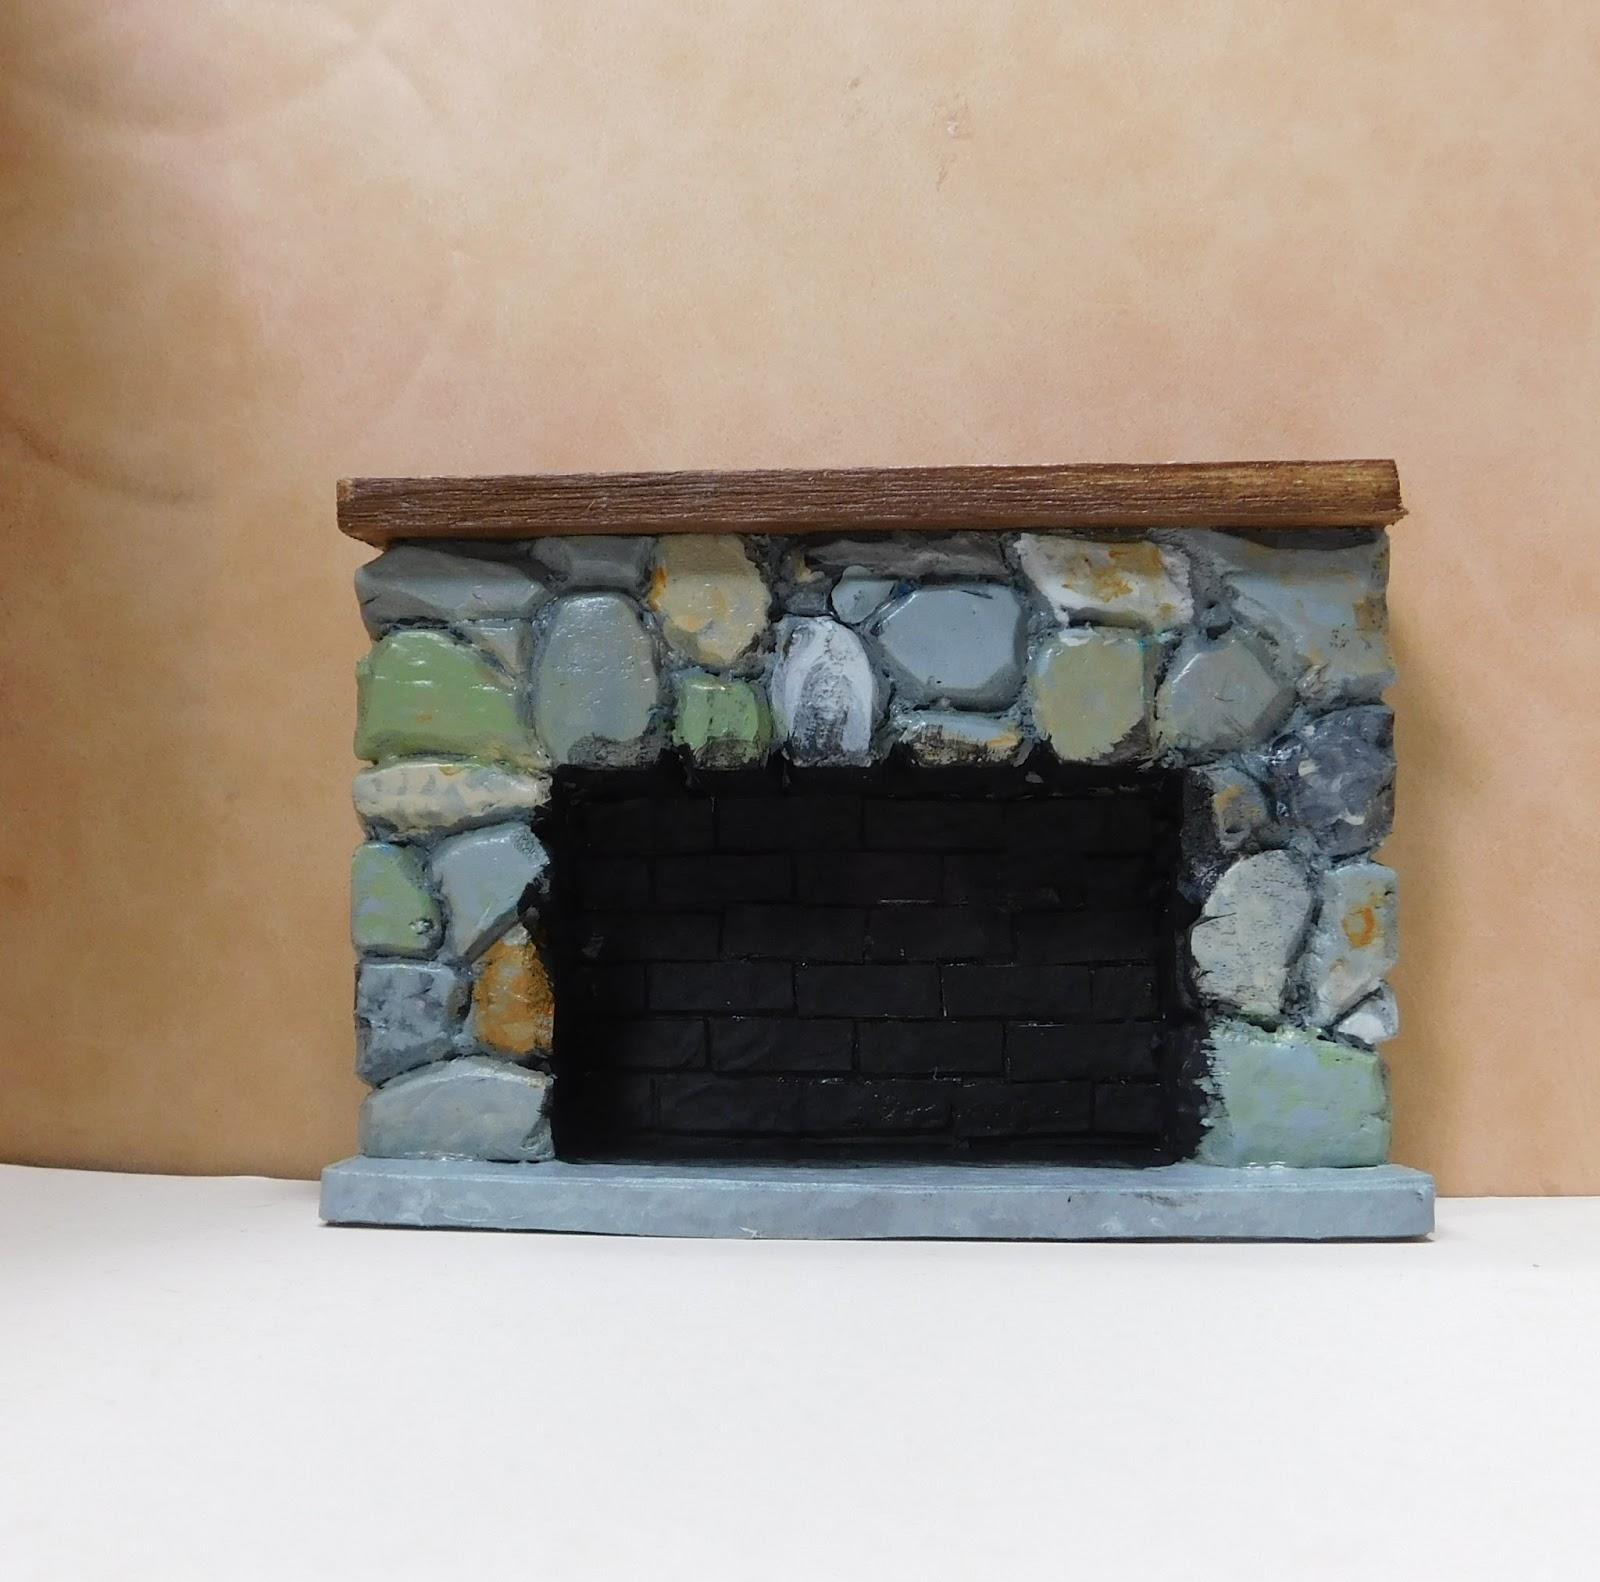 Joanne's Minis: Dollhouse Miniature Stone Fireplace